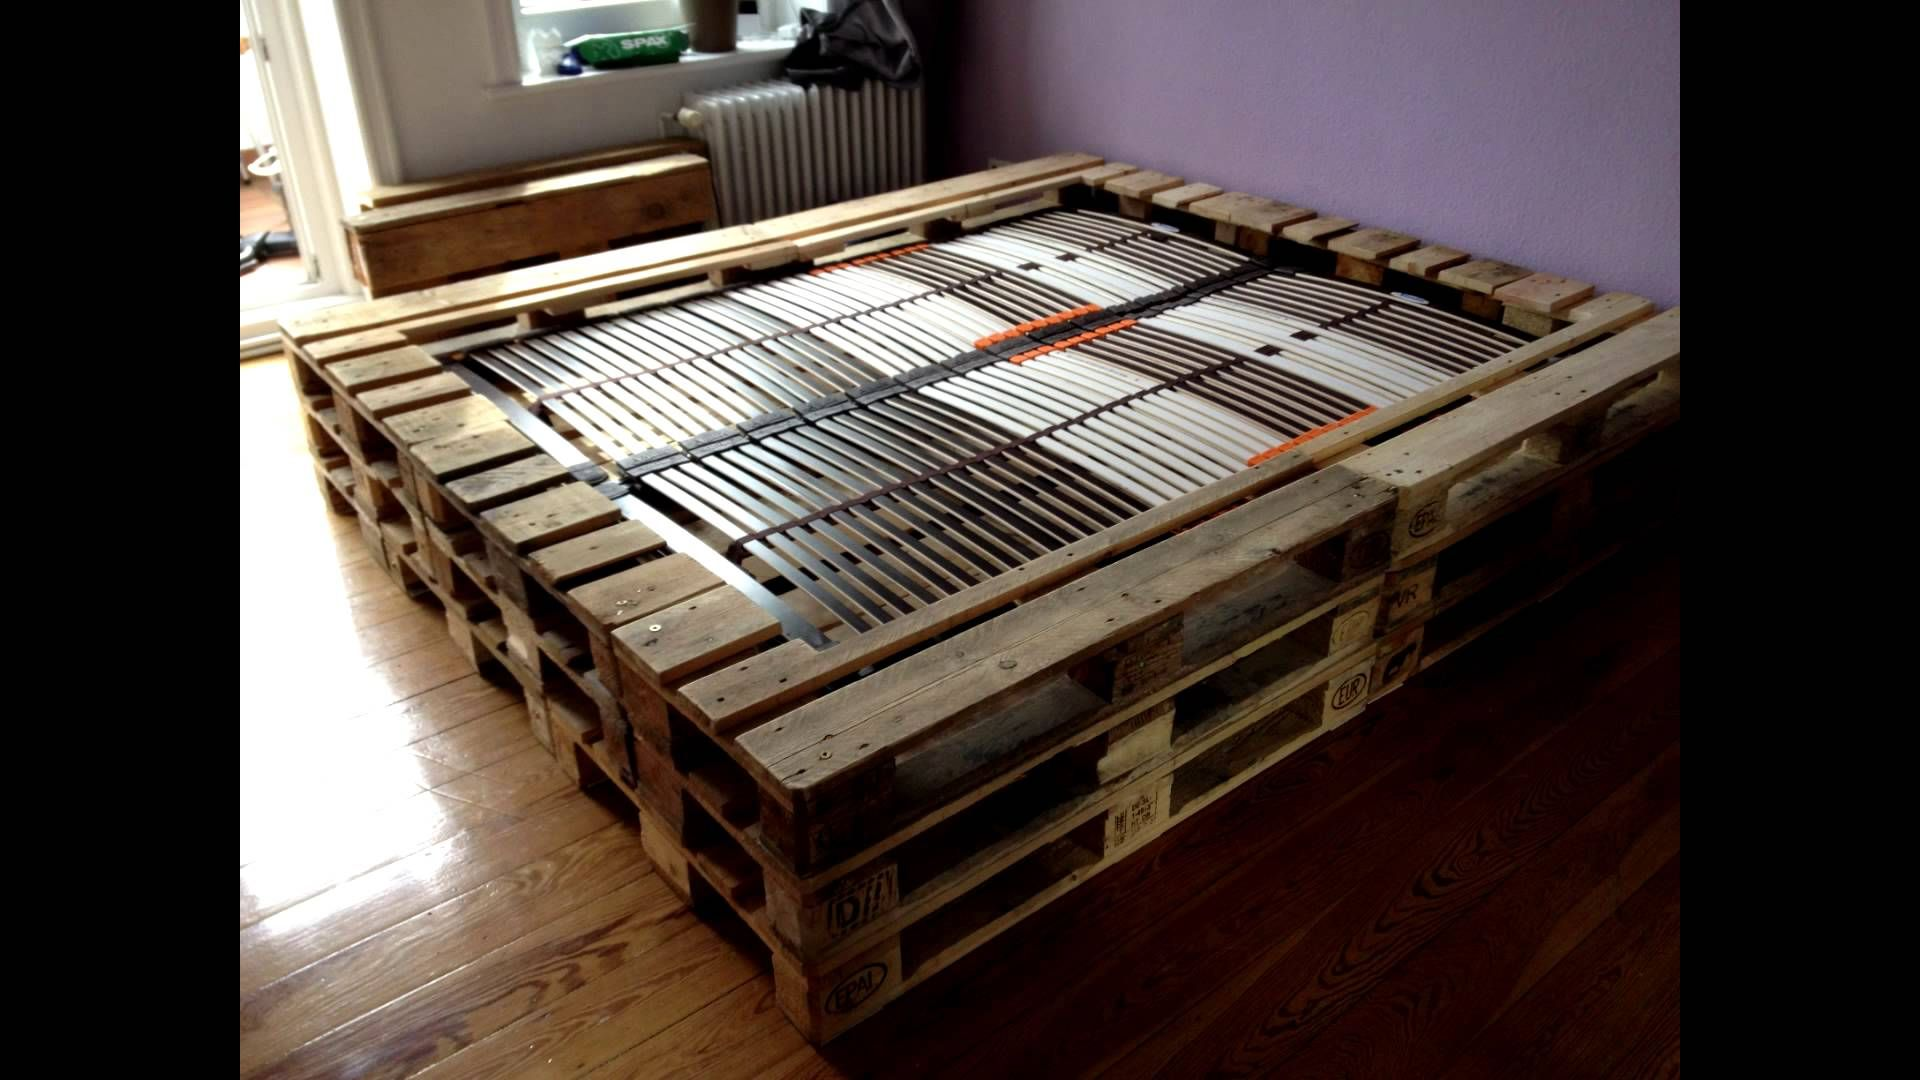 Möbel selber bauen europaletten  Doppelbett aus Europaletten | JUSTDOIT. | Pinterest | Doppelbett ...